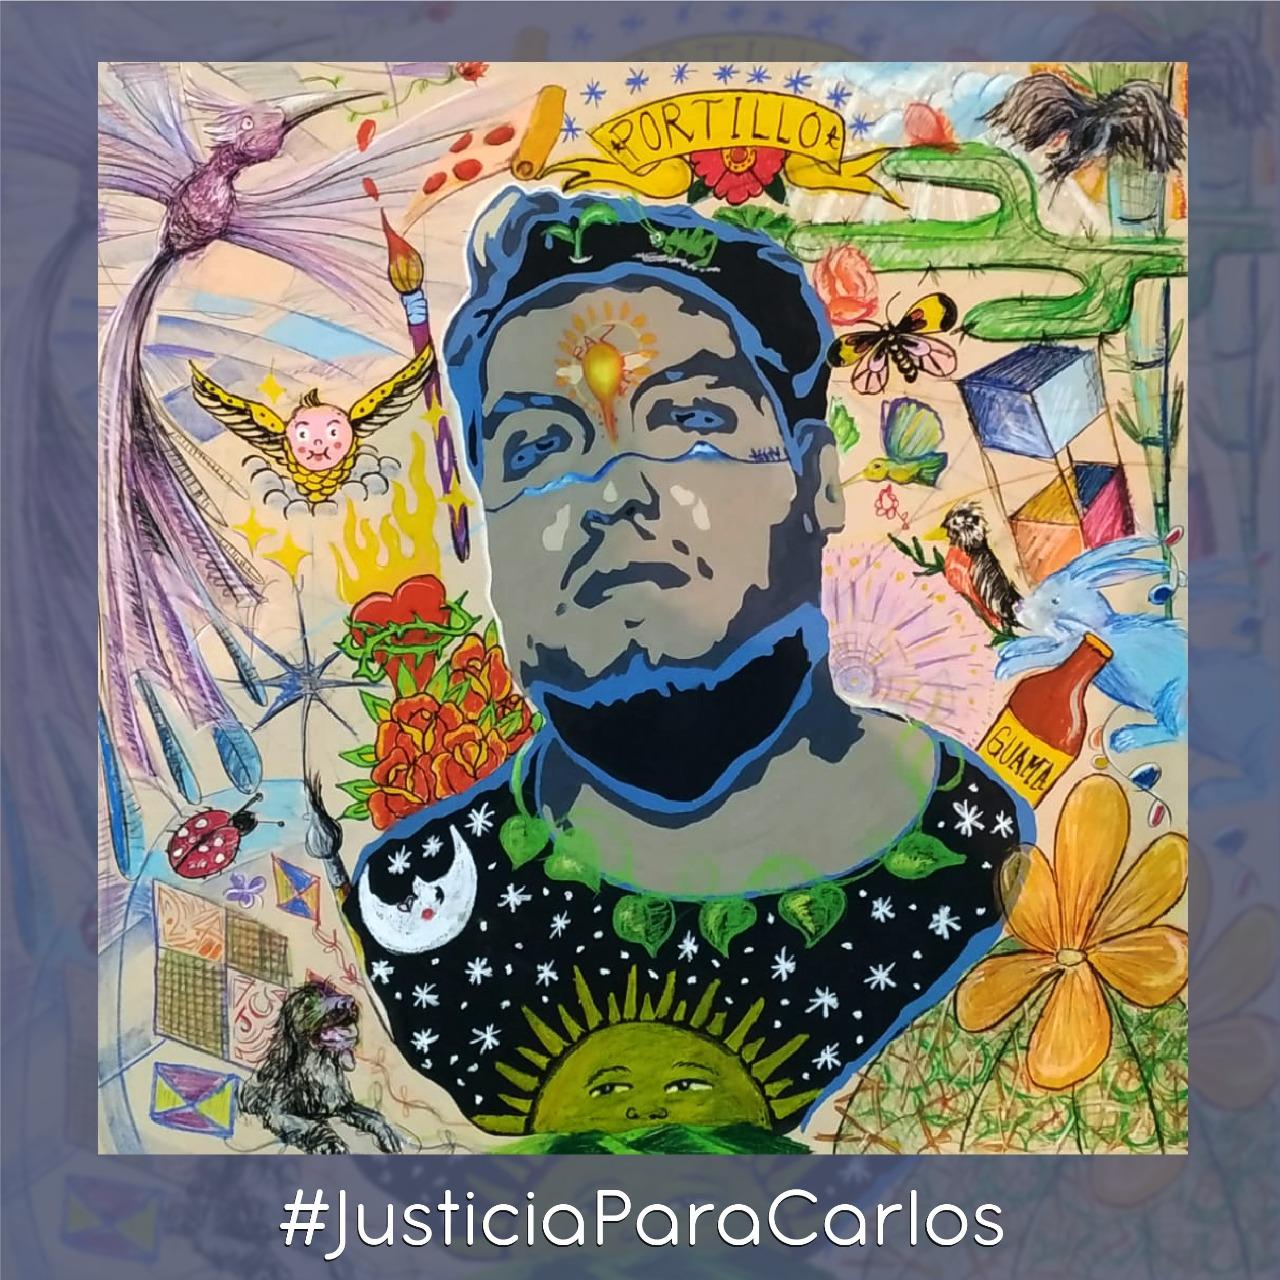 """Todo apunta a un abuso policial"":  Barbosa Huerta en torno a muerte de Juan Carlos Portillo en comandancia de Xoxtla"